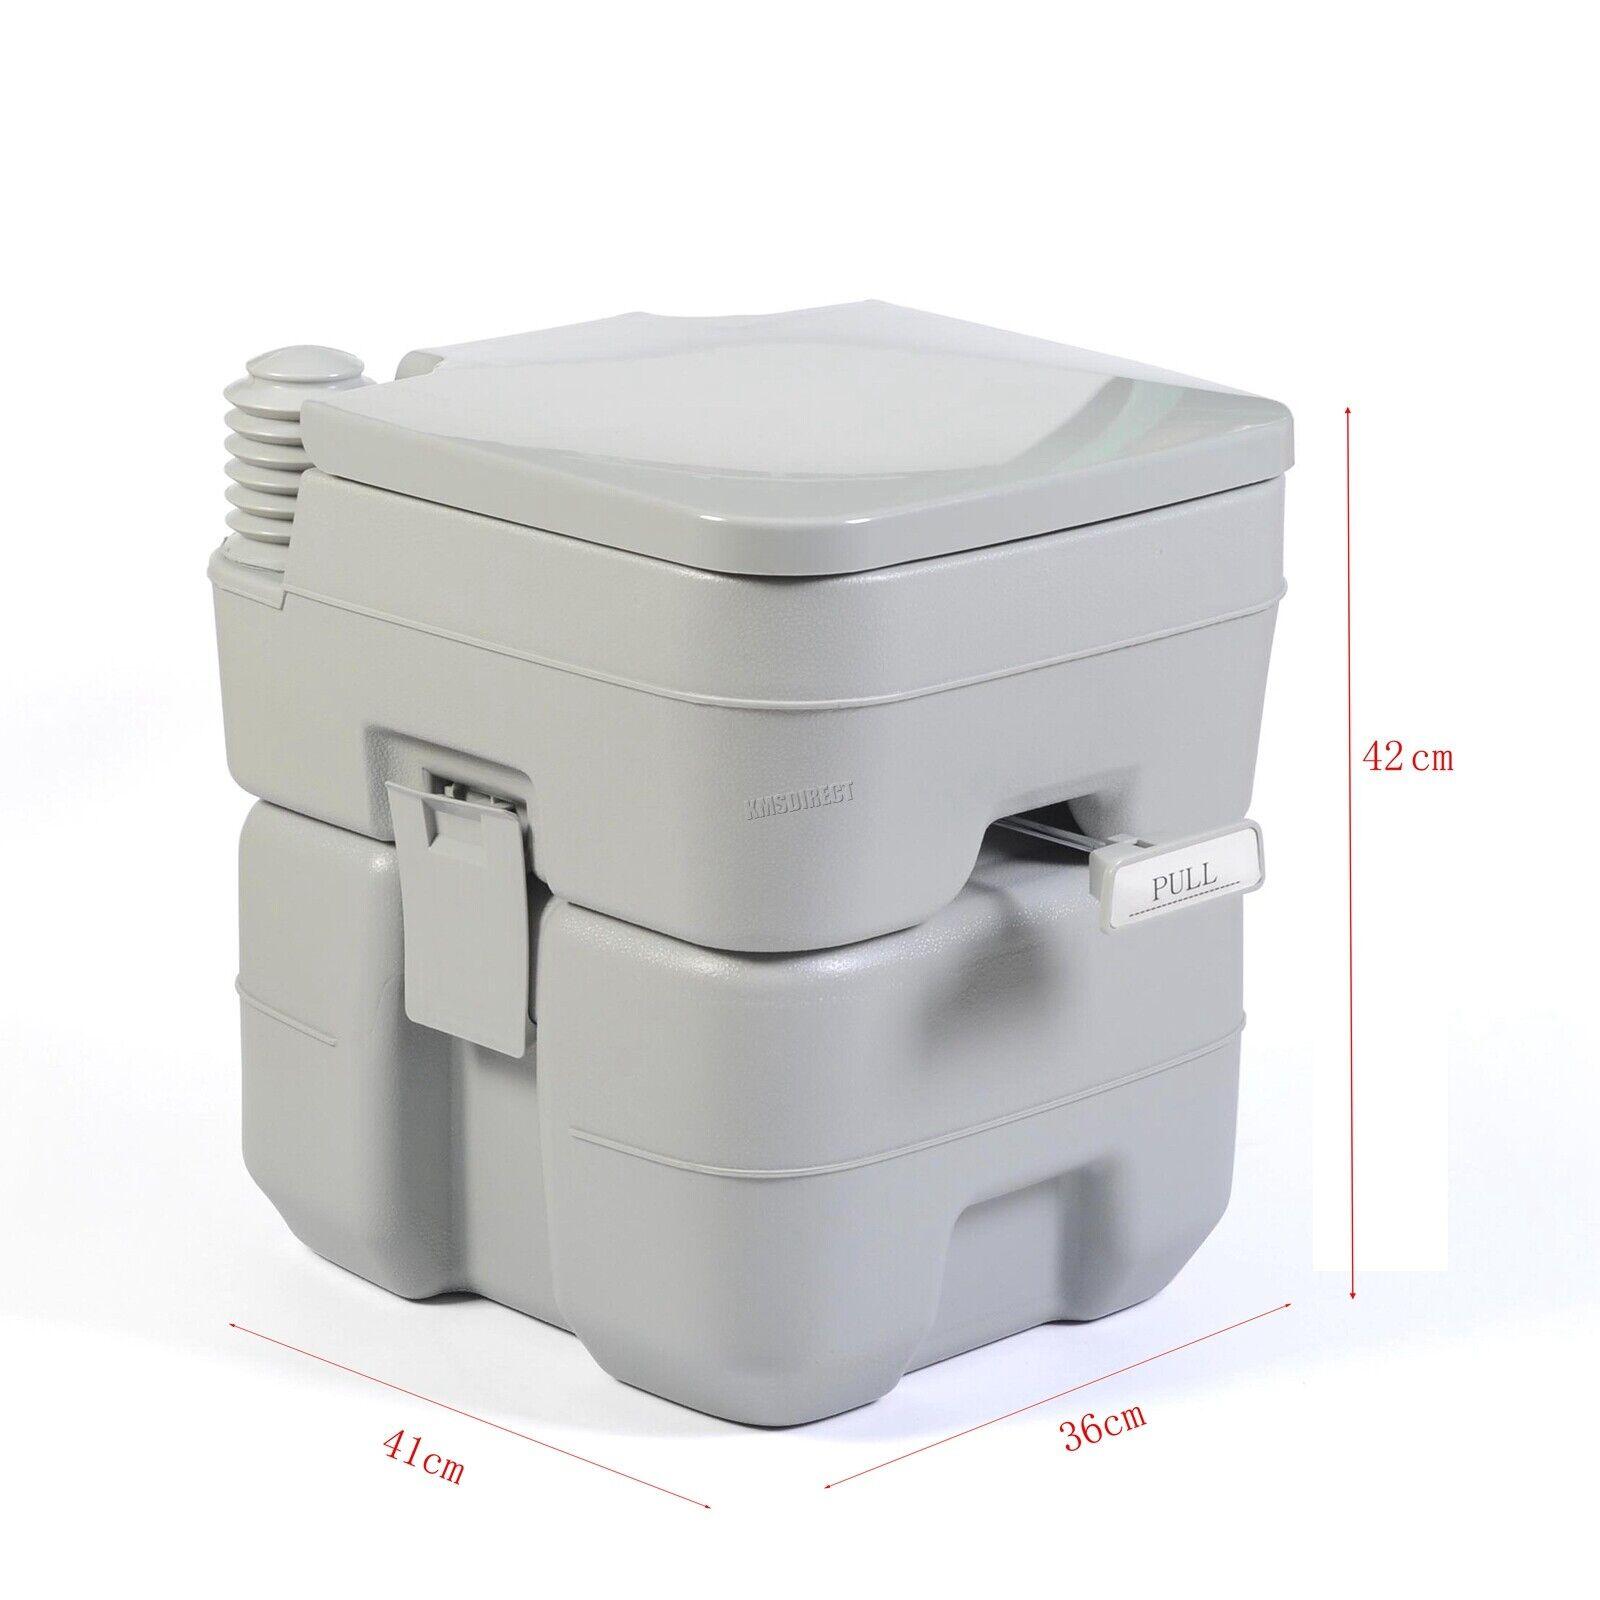 FoxHunter 20L Portable Toilet Flush Caravan Camping Travel WC Loo Porta Potty 11